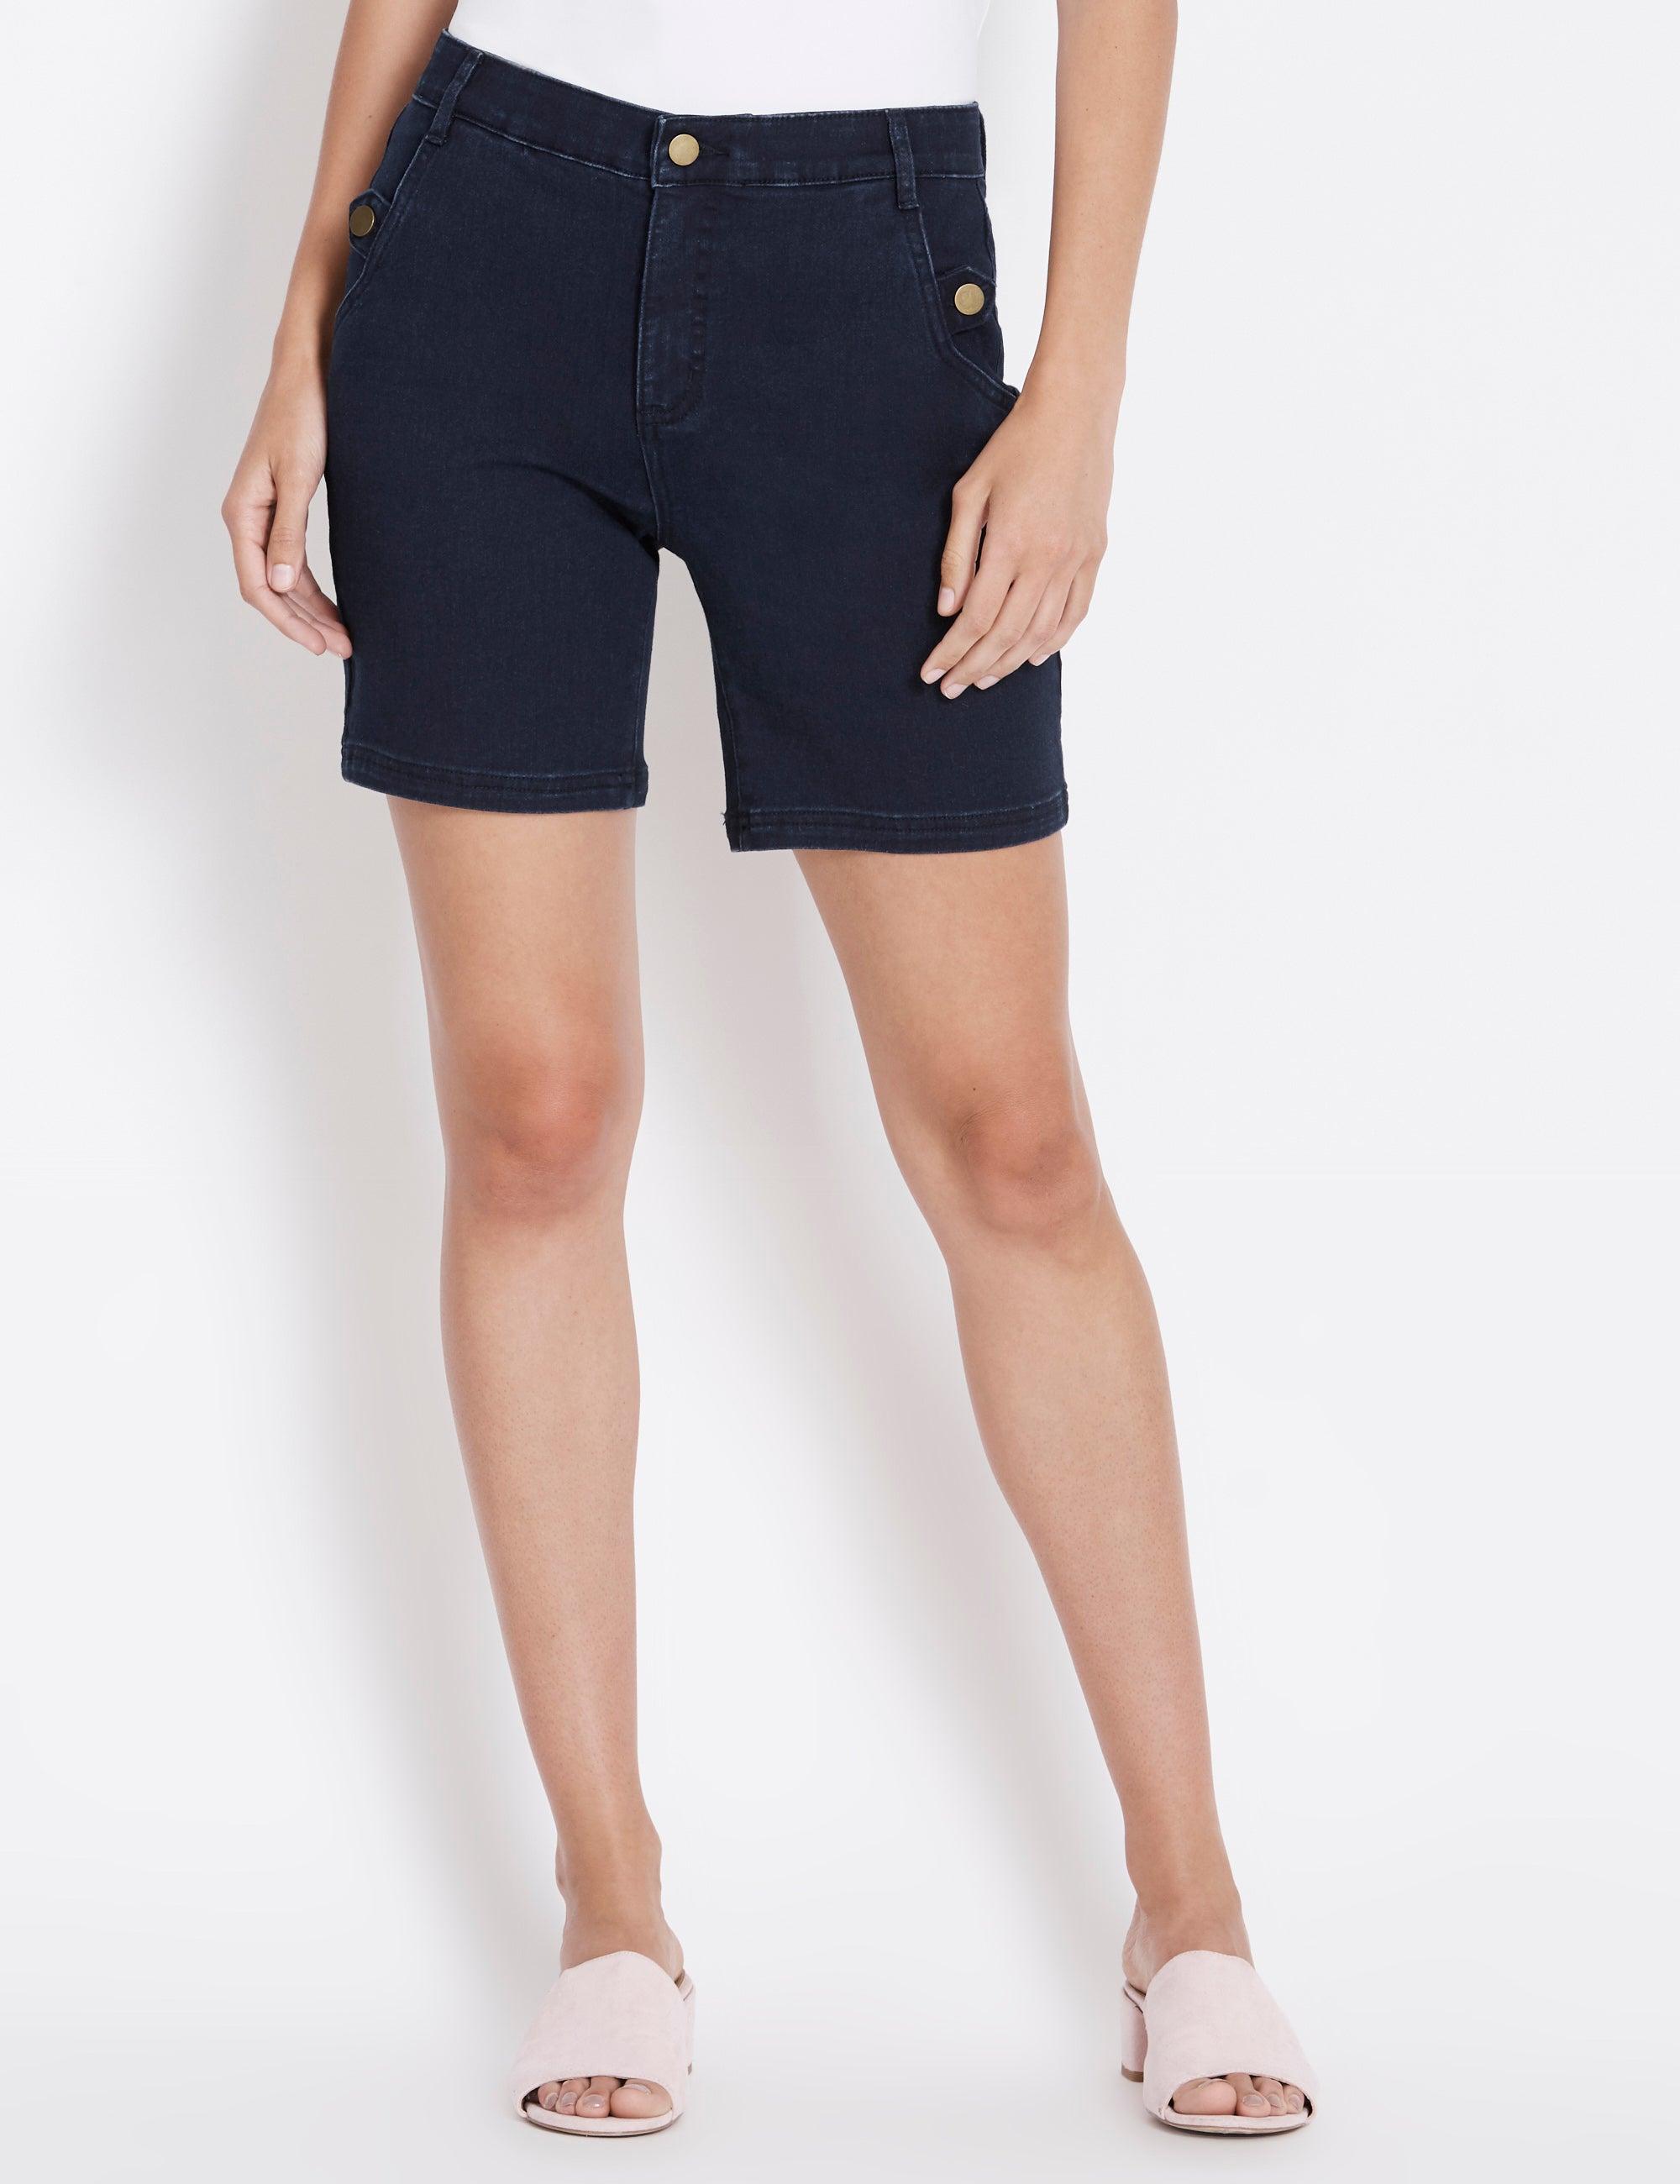 womens knee length shorts australia